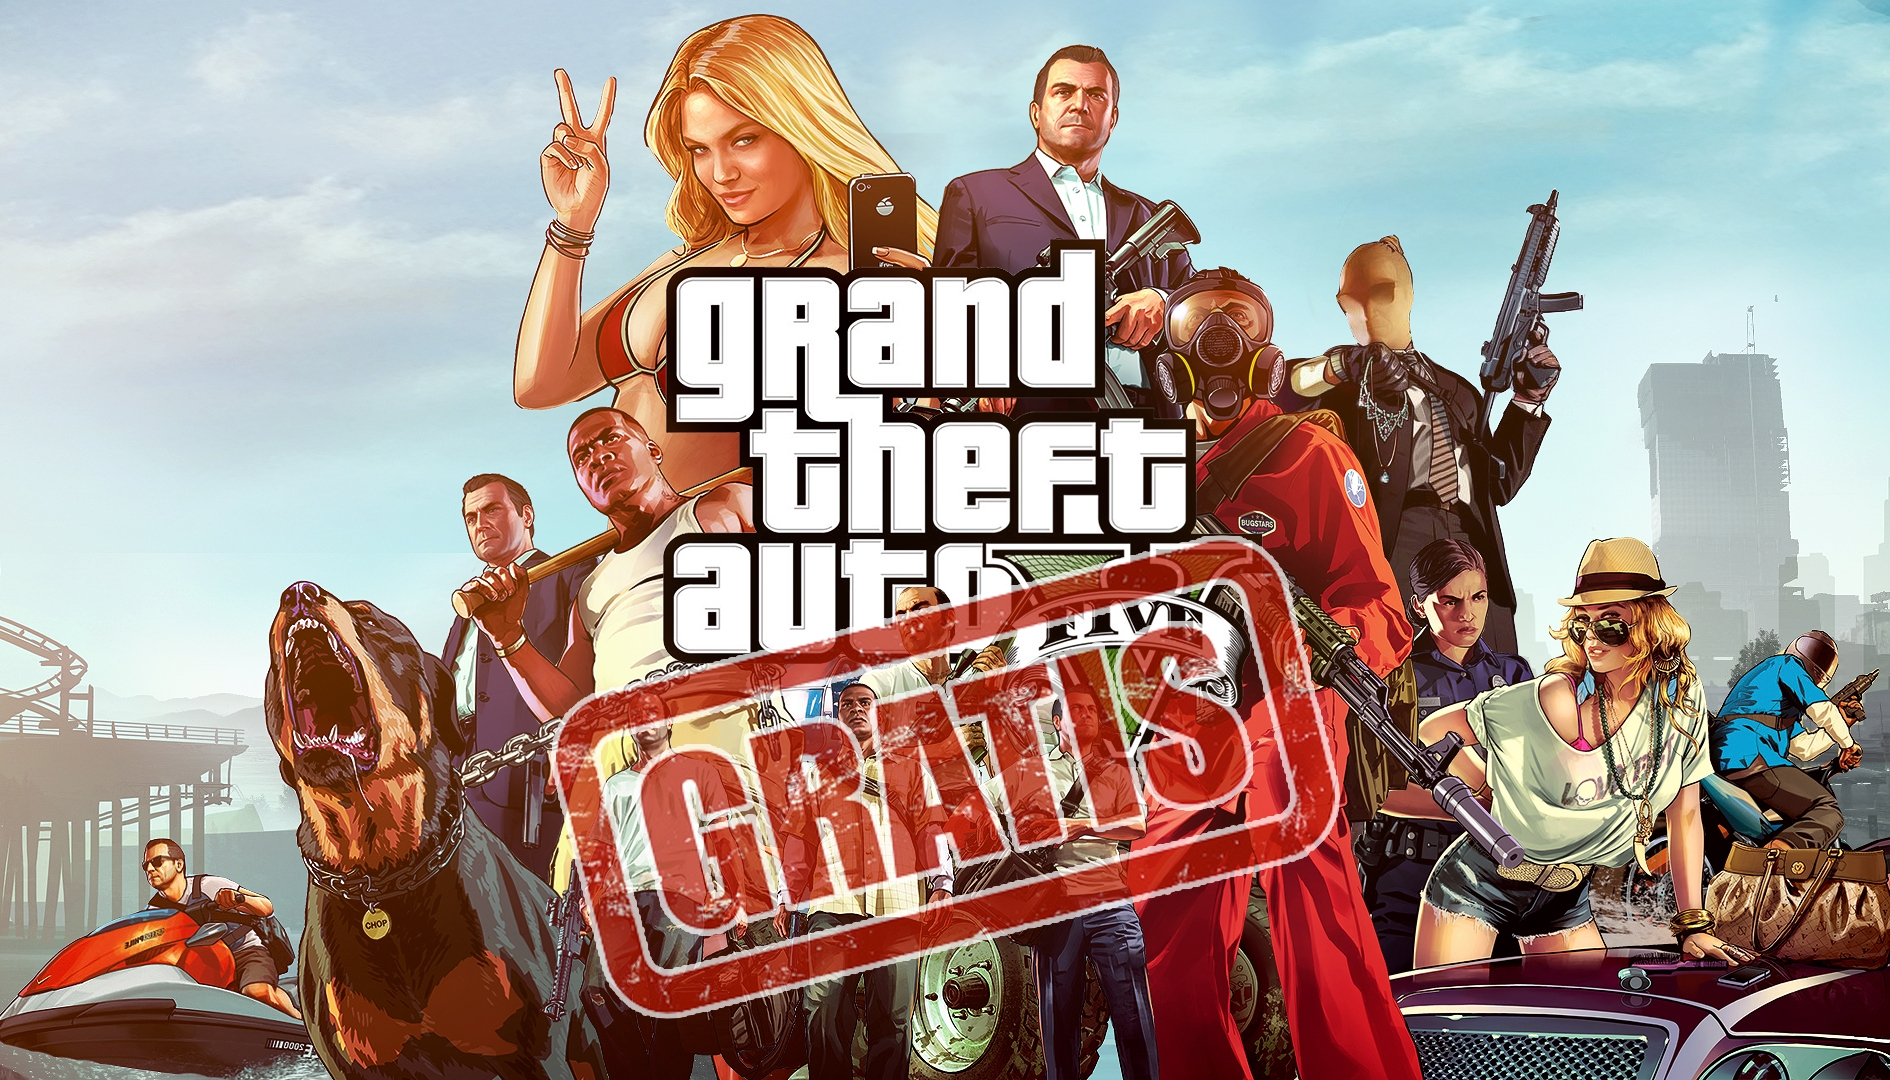 GTA V gratis ha spinto Epic Games, milioni di account gratis per riscattarlo